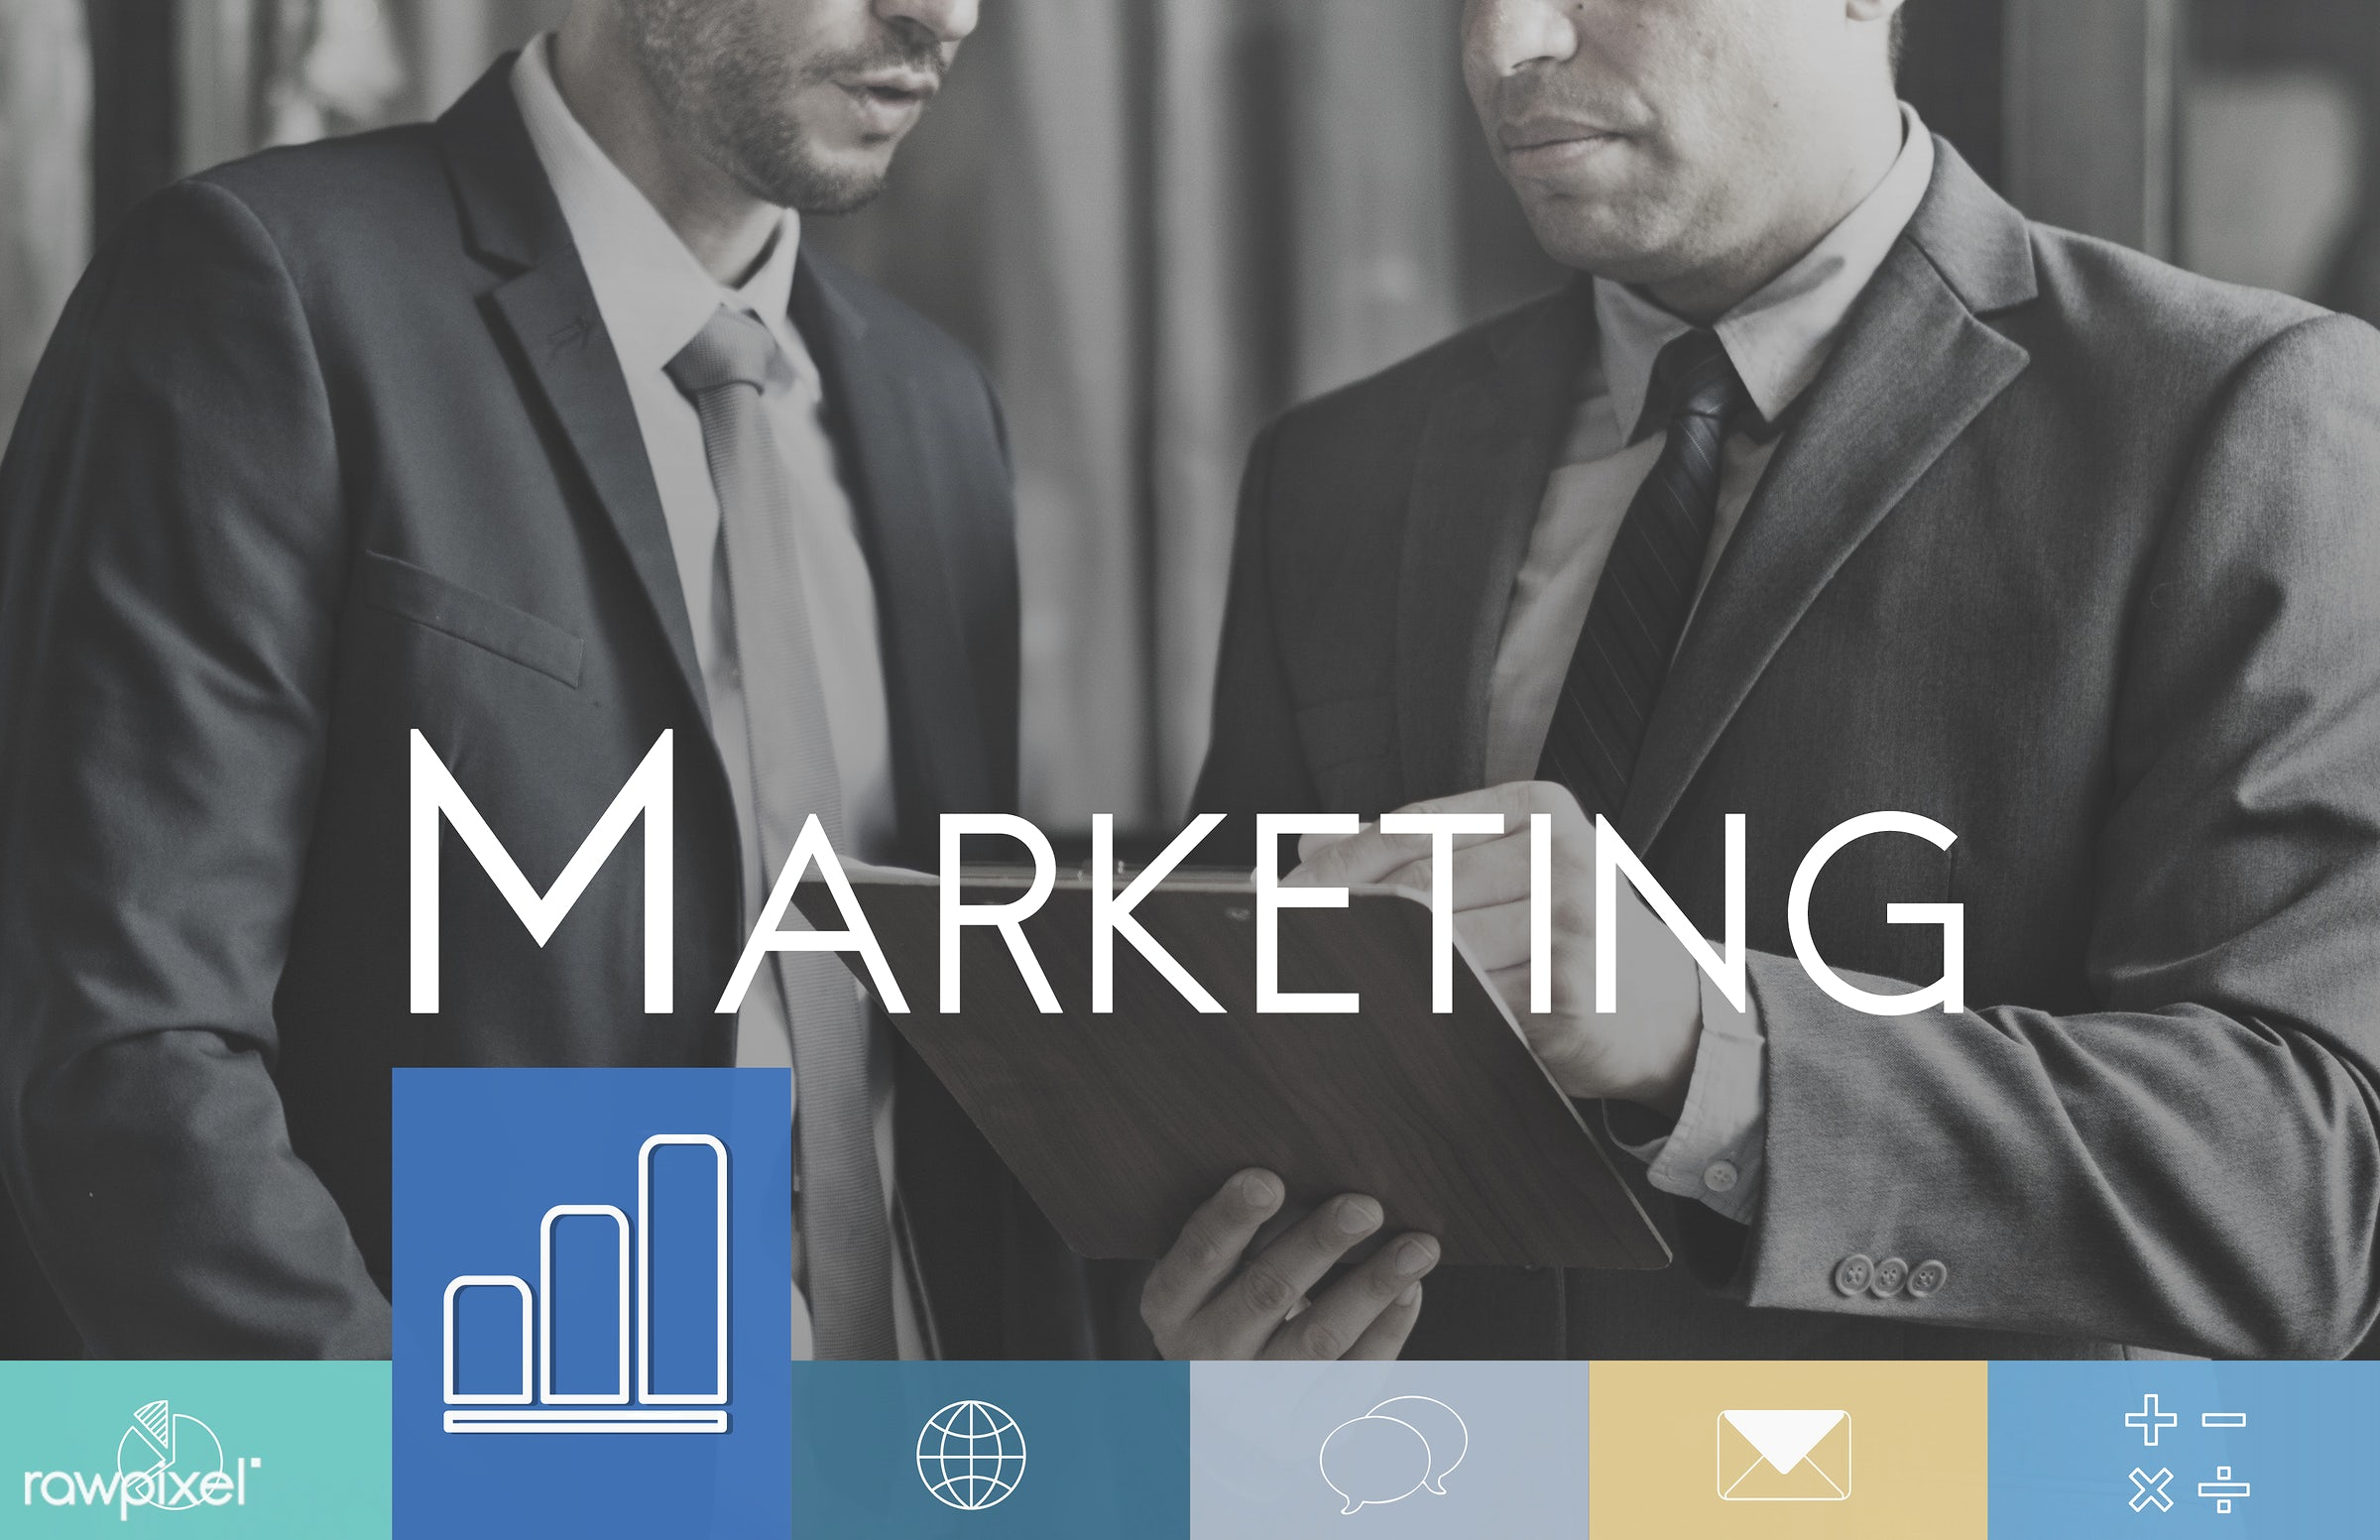 analytics, board, business, businessman, businessmen, caucasian, chart, conversation, digital marketing, global business,...